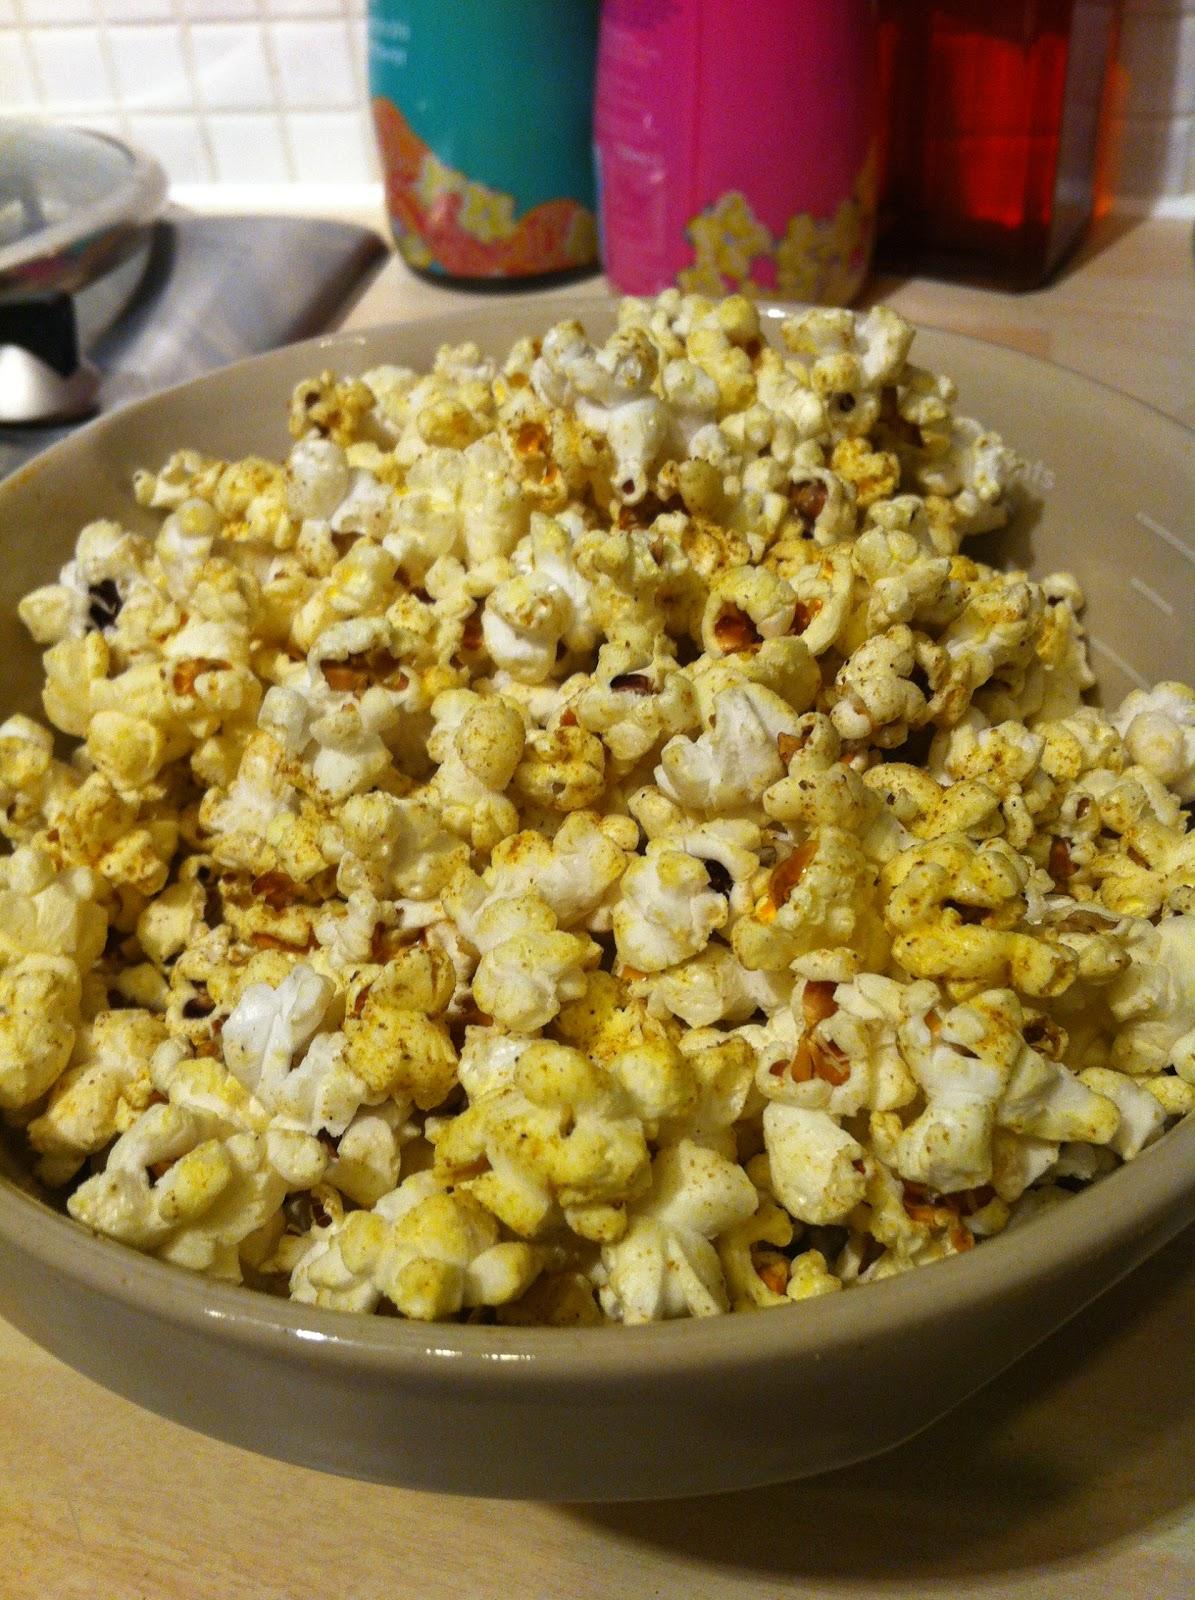 Gourmet Gob: Curry popcorn!